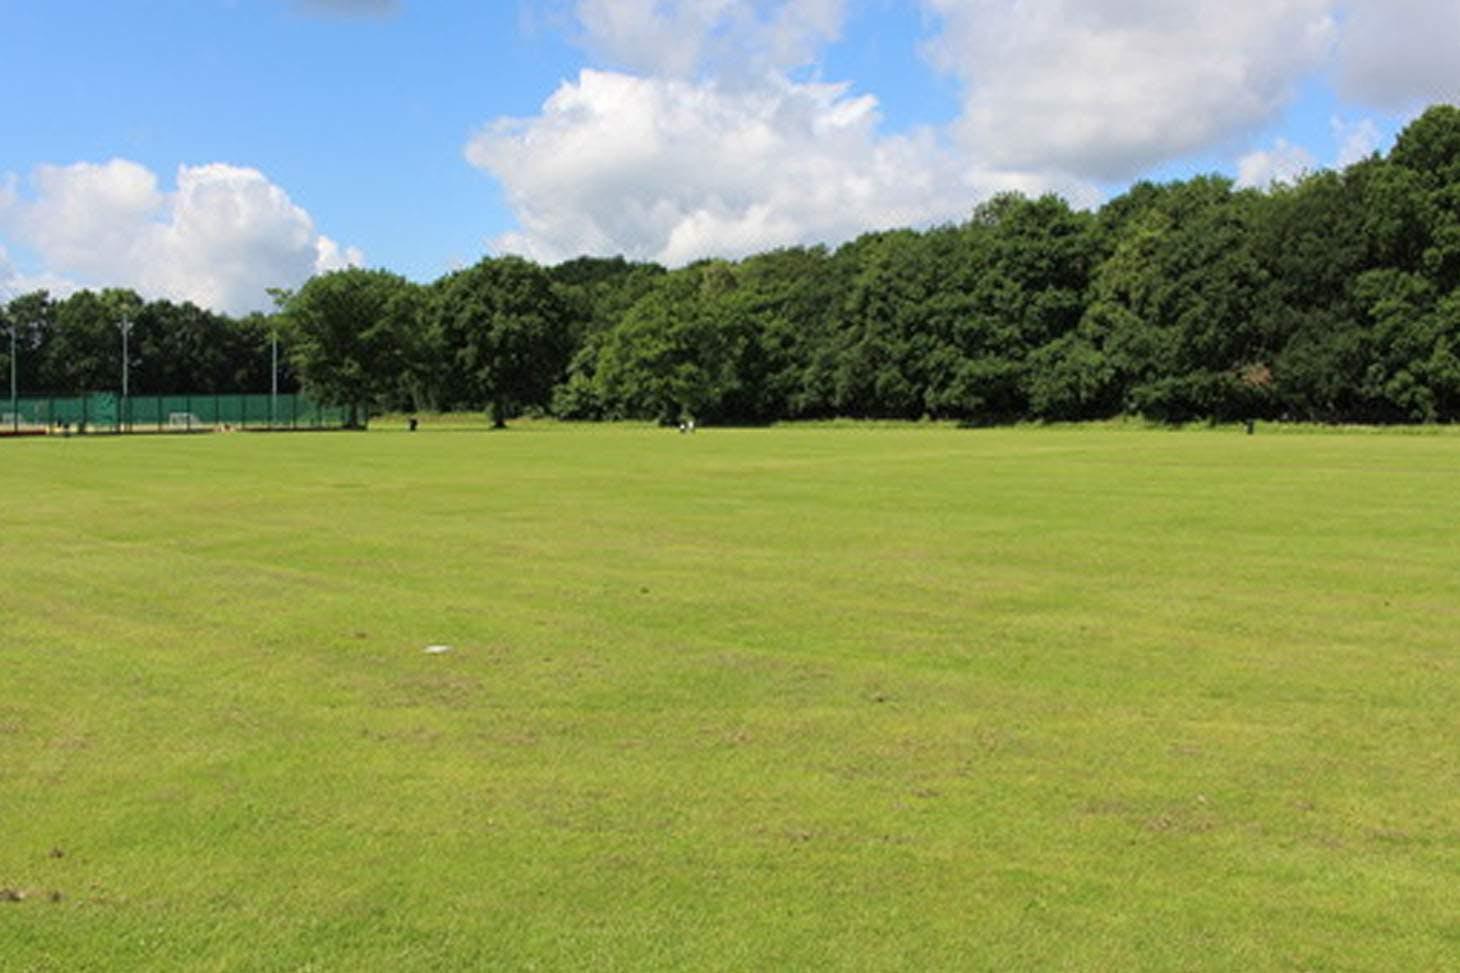 Light Hall School Outdoor | Grass cricket facilities